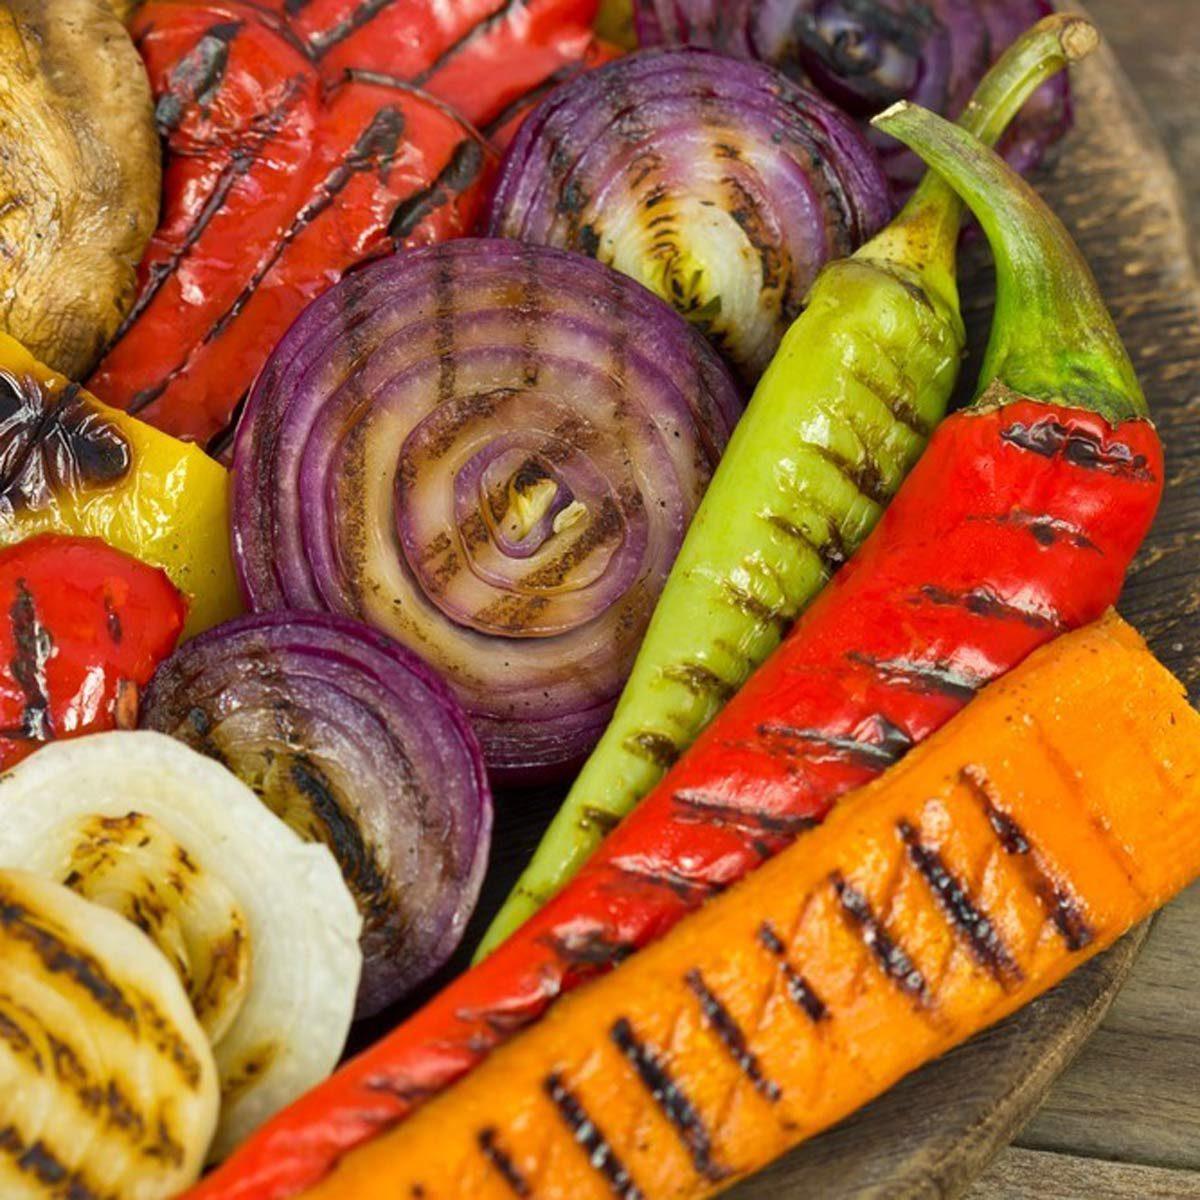 Make a Charred Vegetable Salad